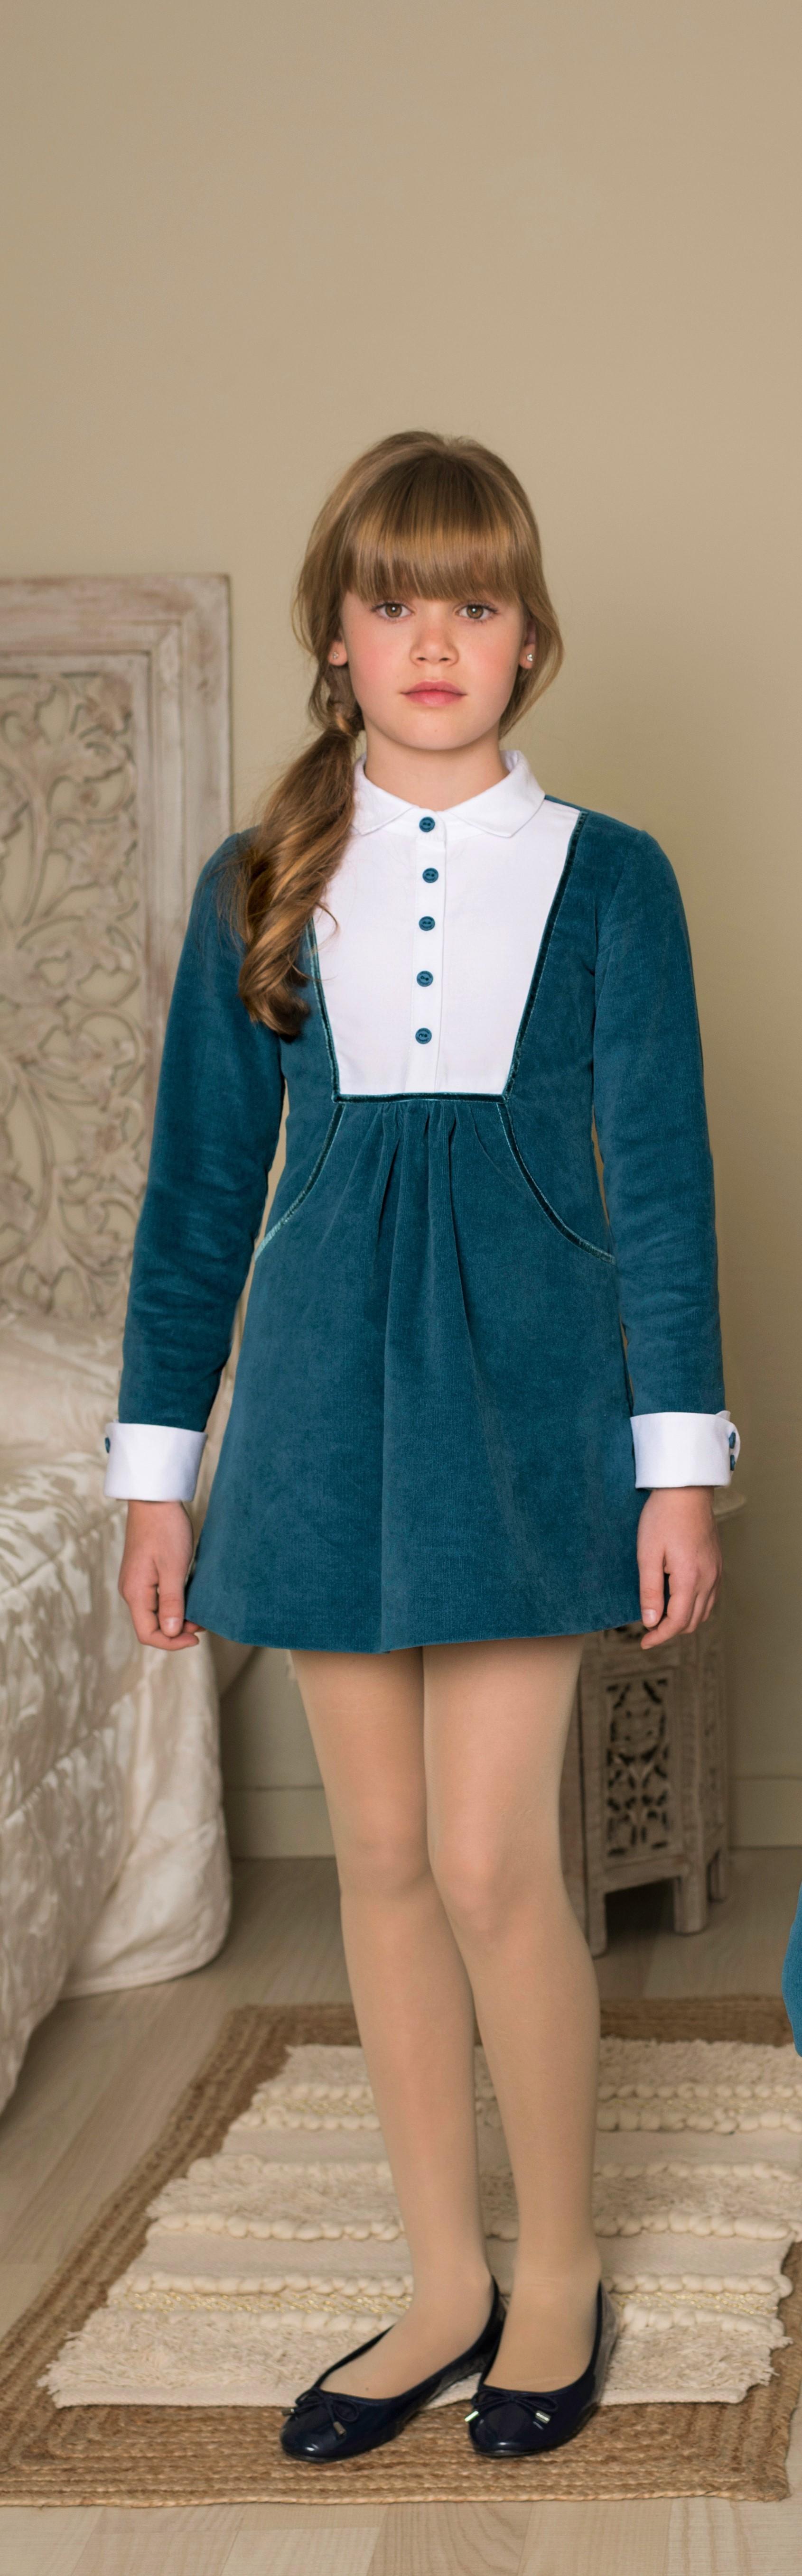 Vestido Nekenia Ref. 1911854